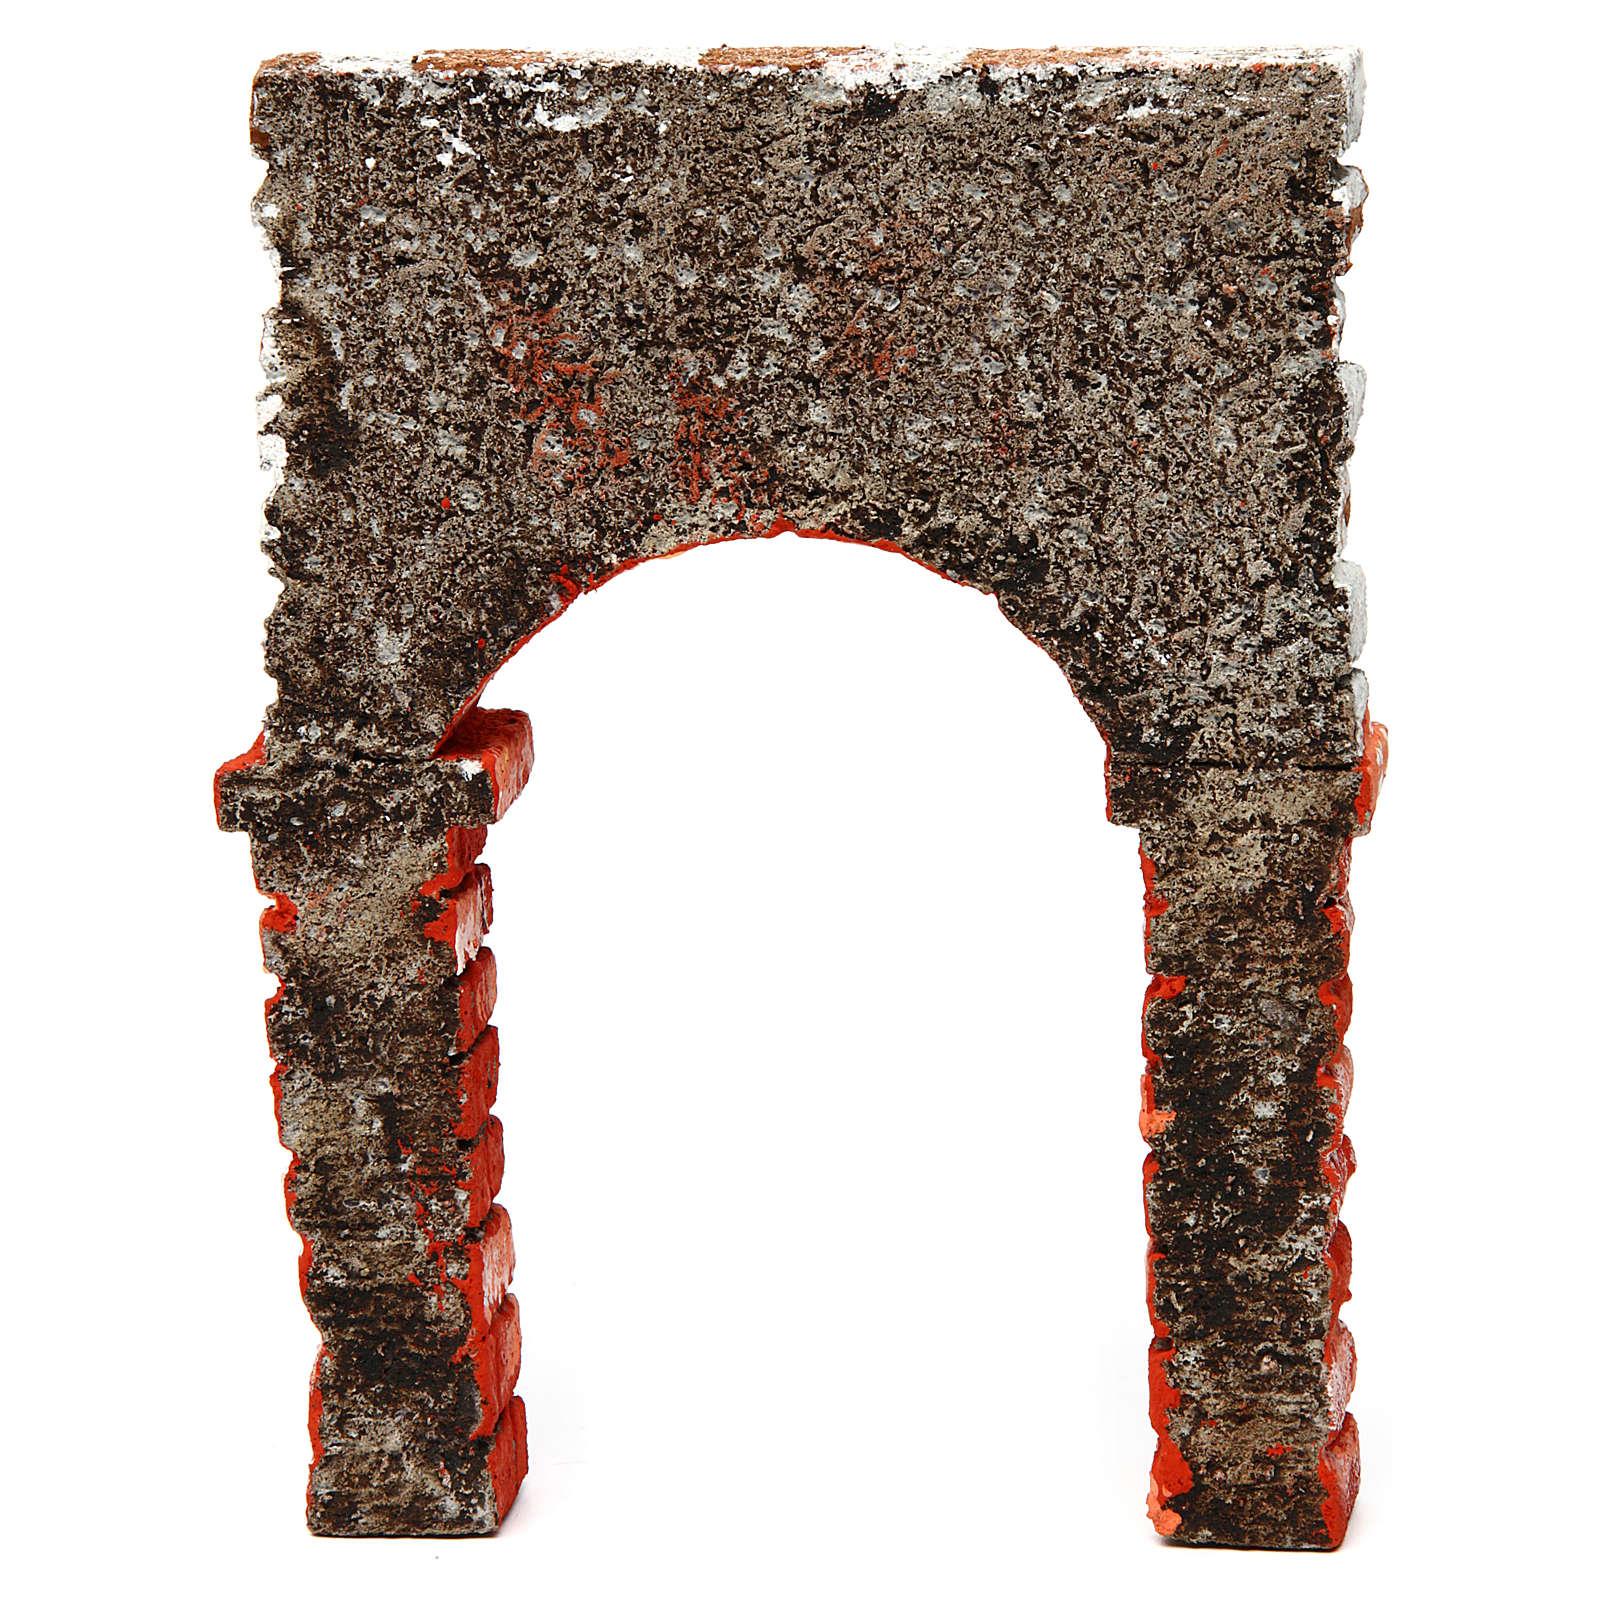 Arco belén de poliestireno 25x15x5 cm 4